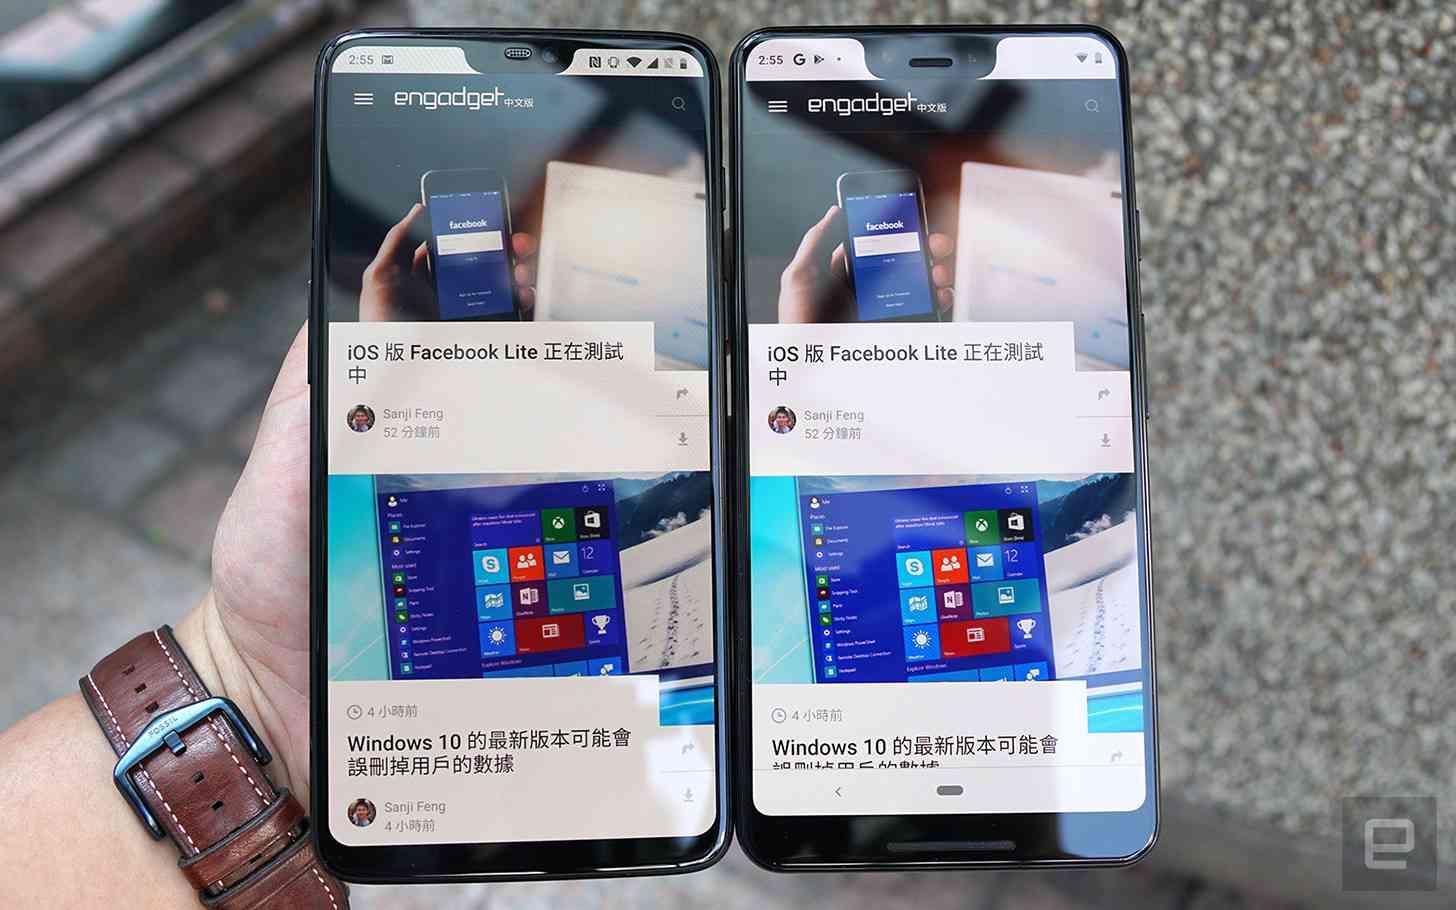 Google Pixel 3 XL OnePlus 6 comparison